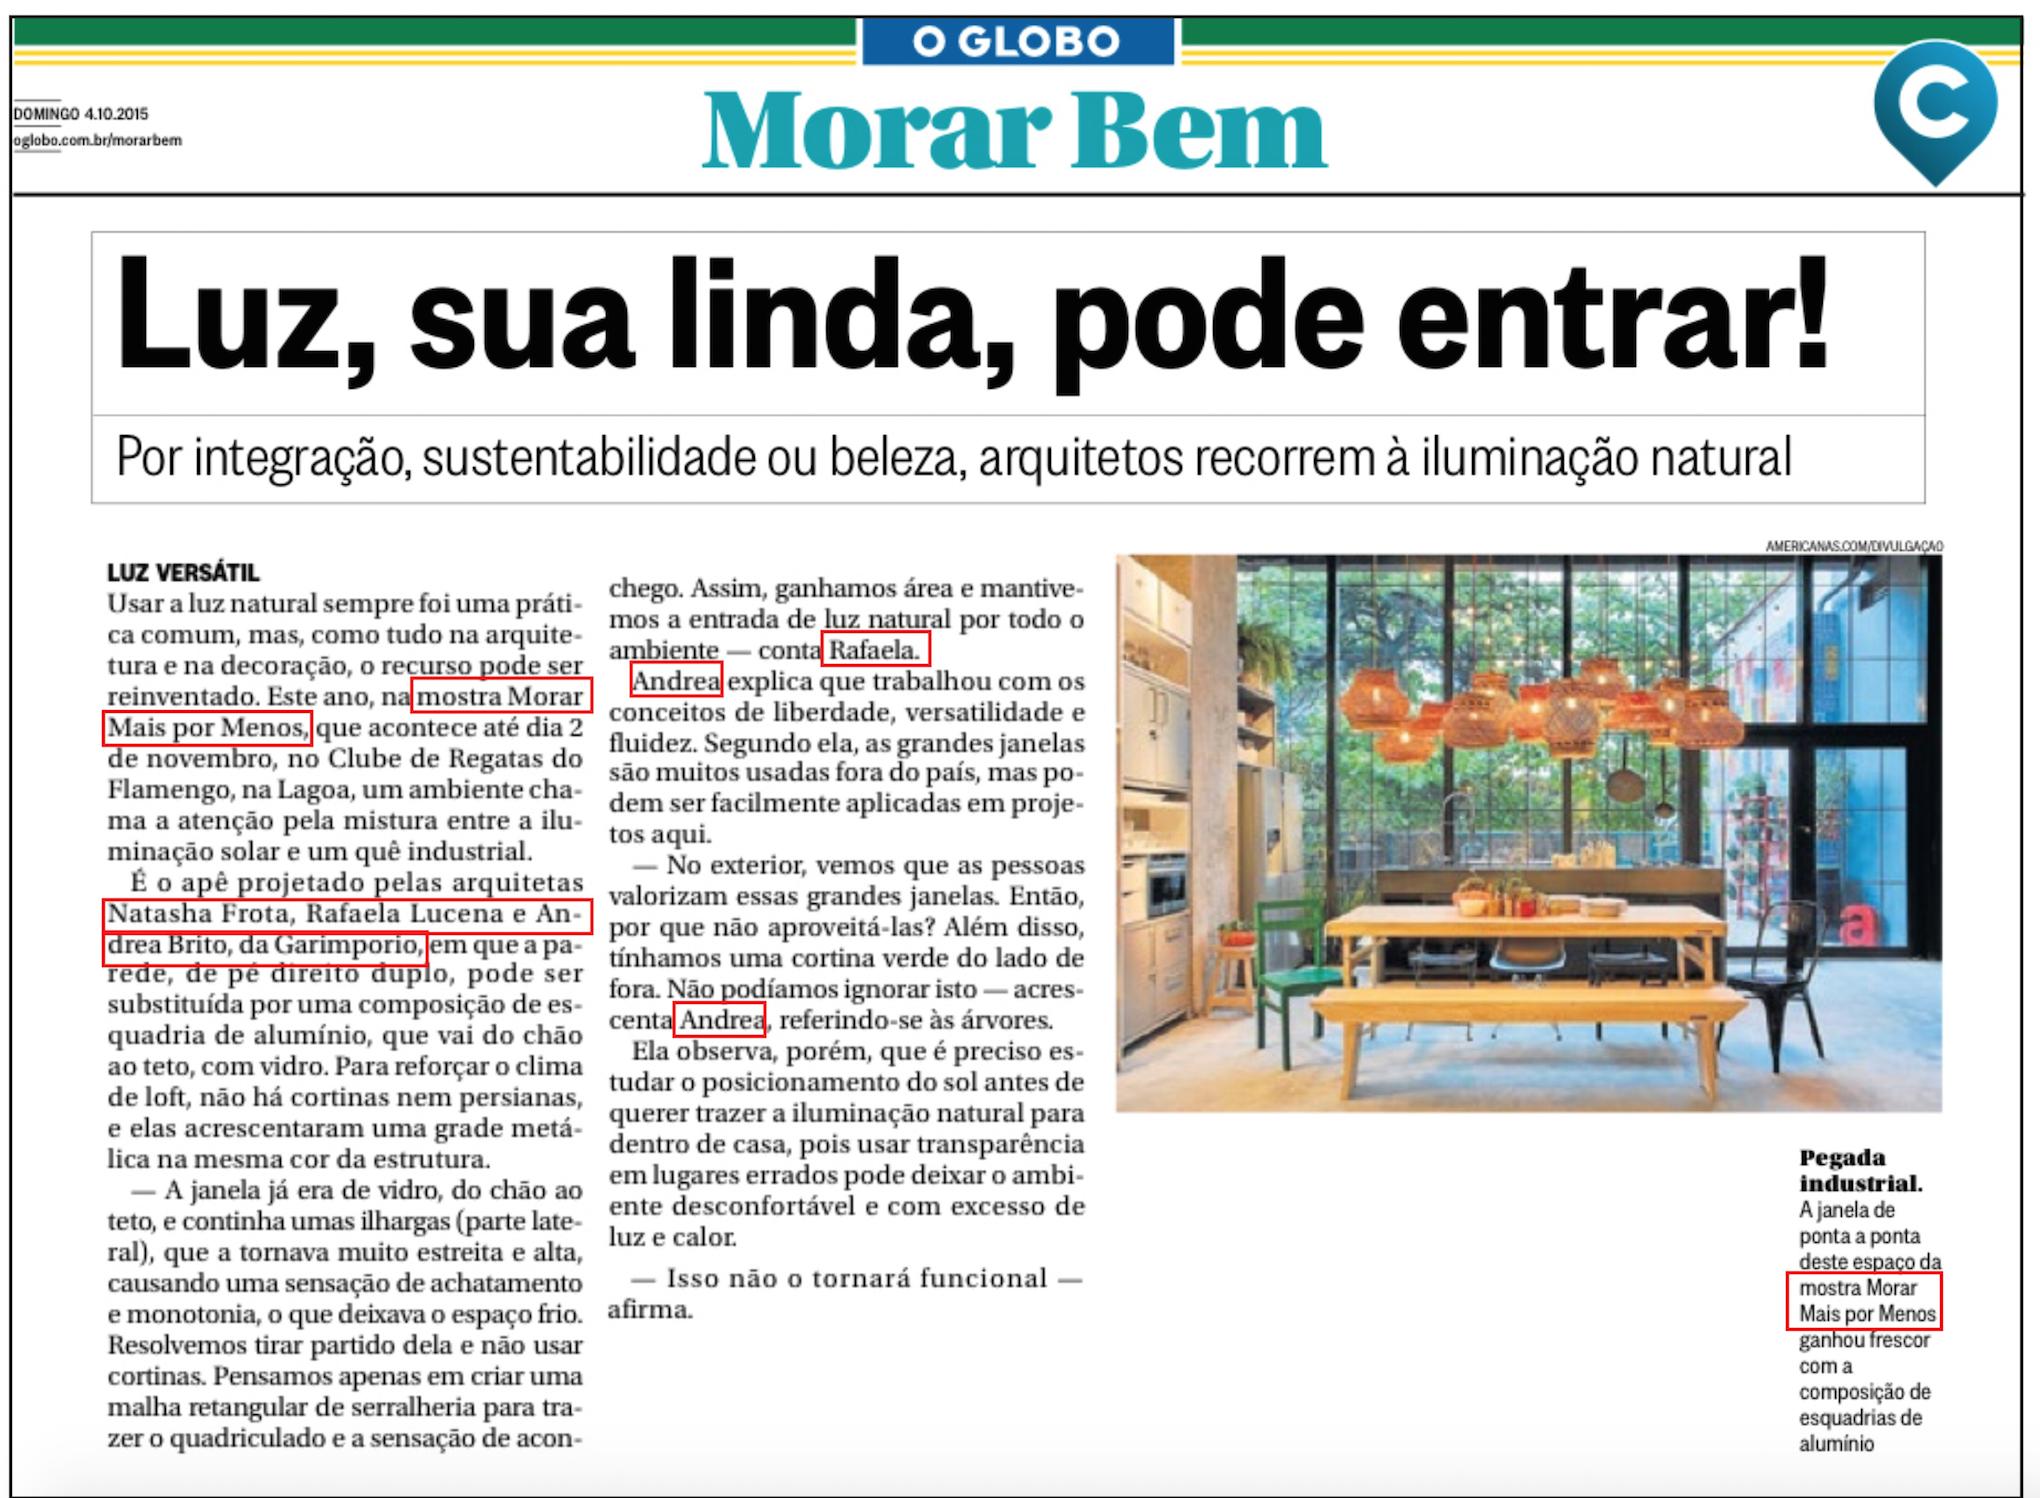 CADERNO MORAR BEM  - JORNAL O GLOBO 04.10.15